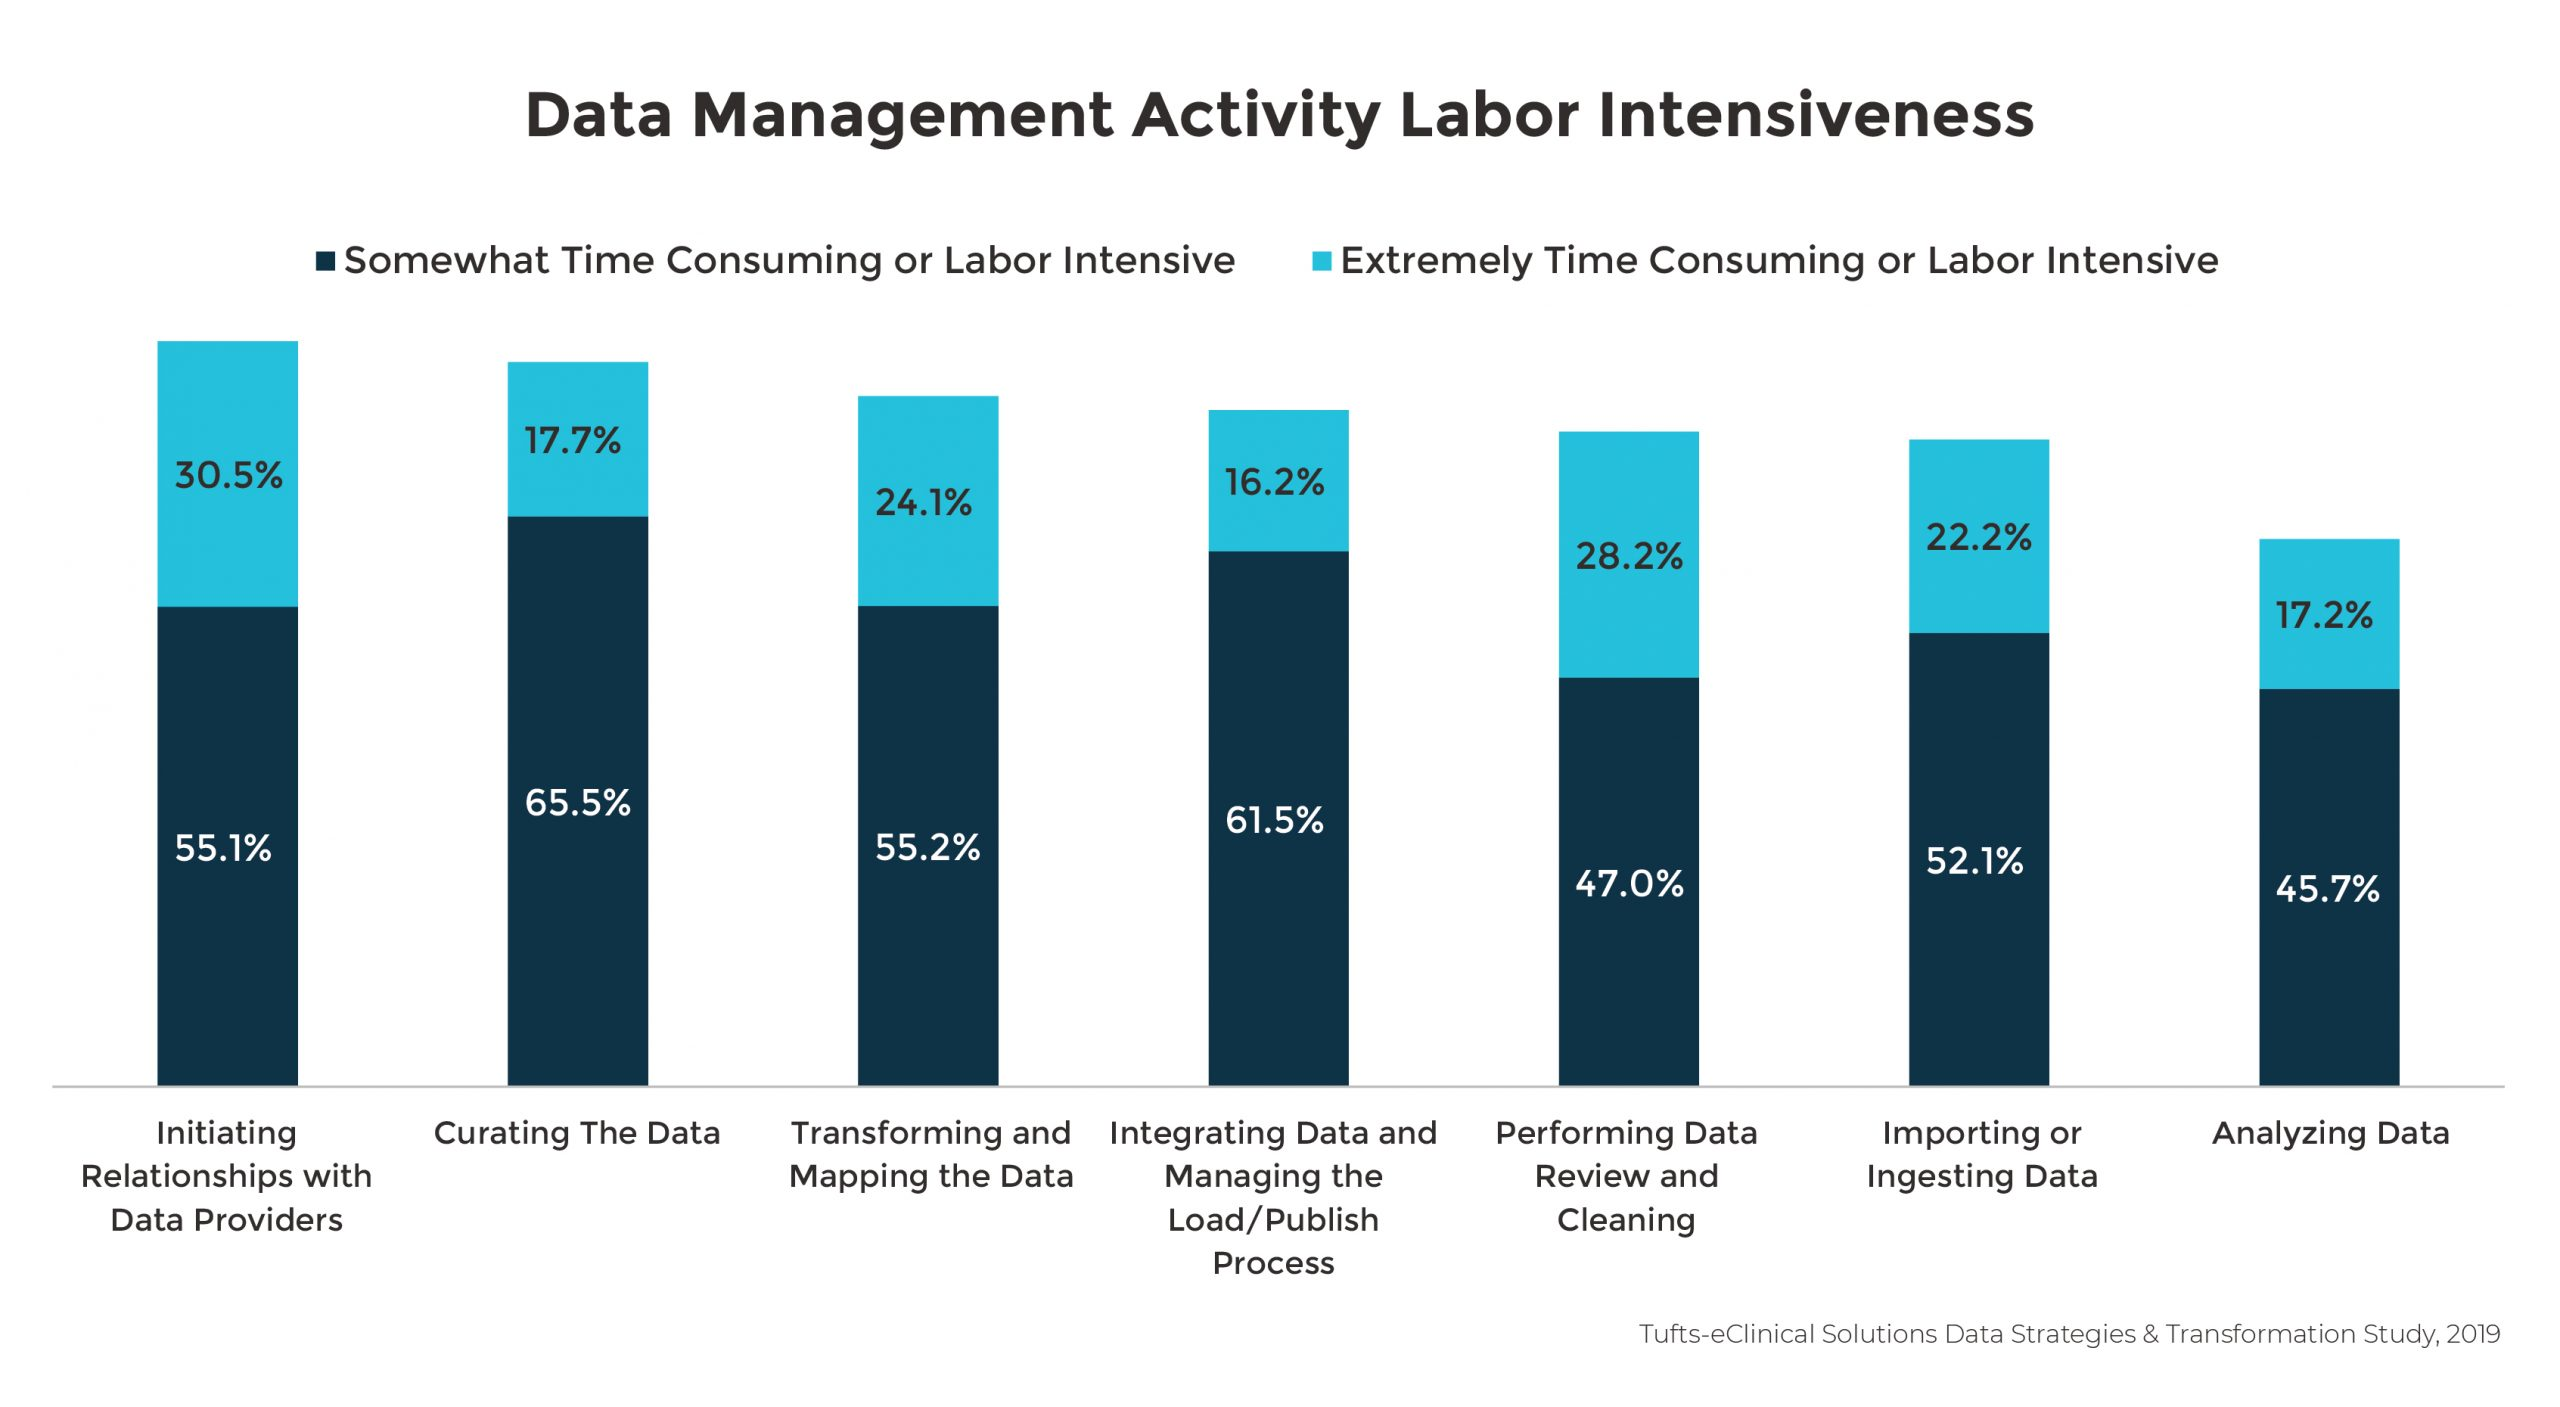 Data Management Activity Labor Intensiveness